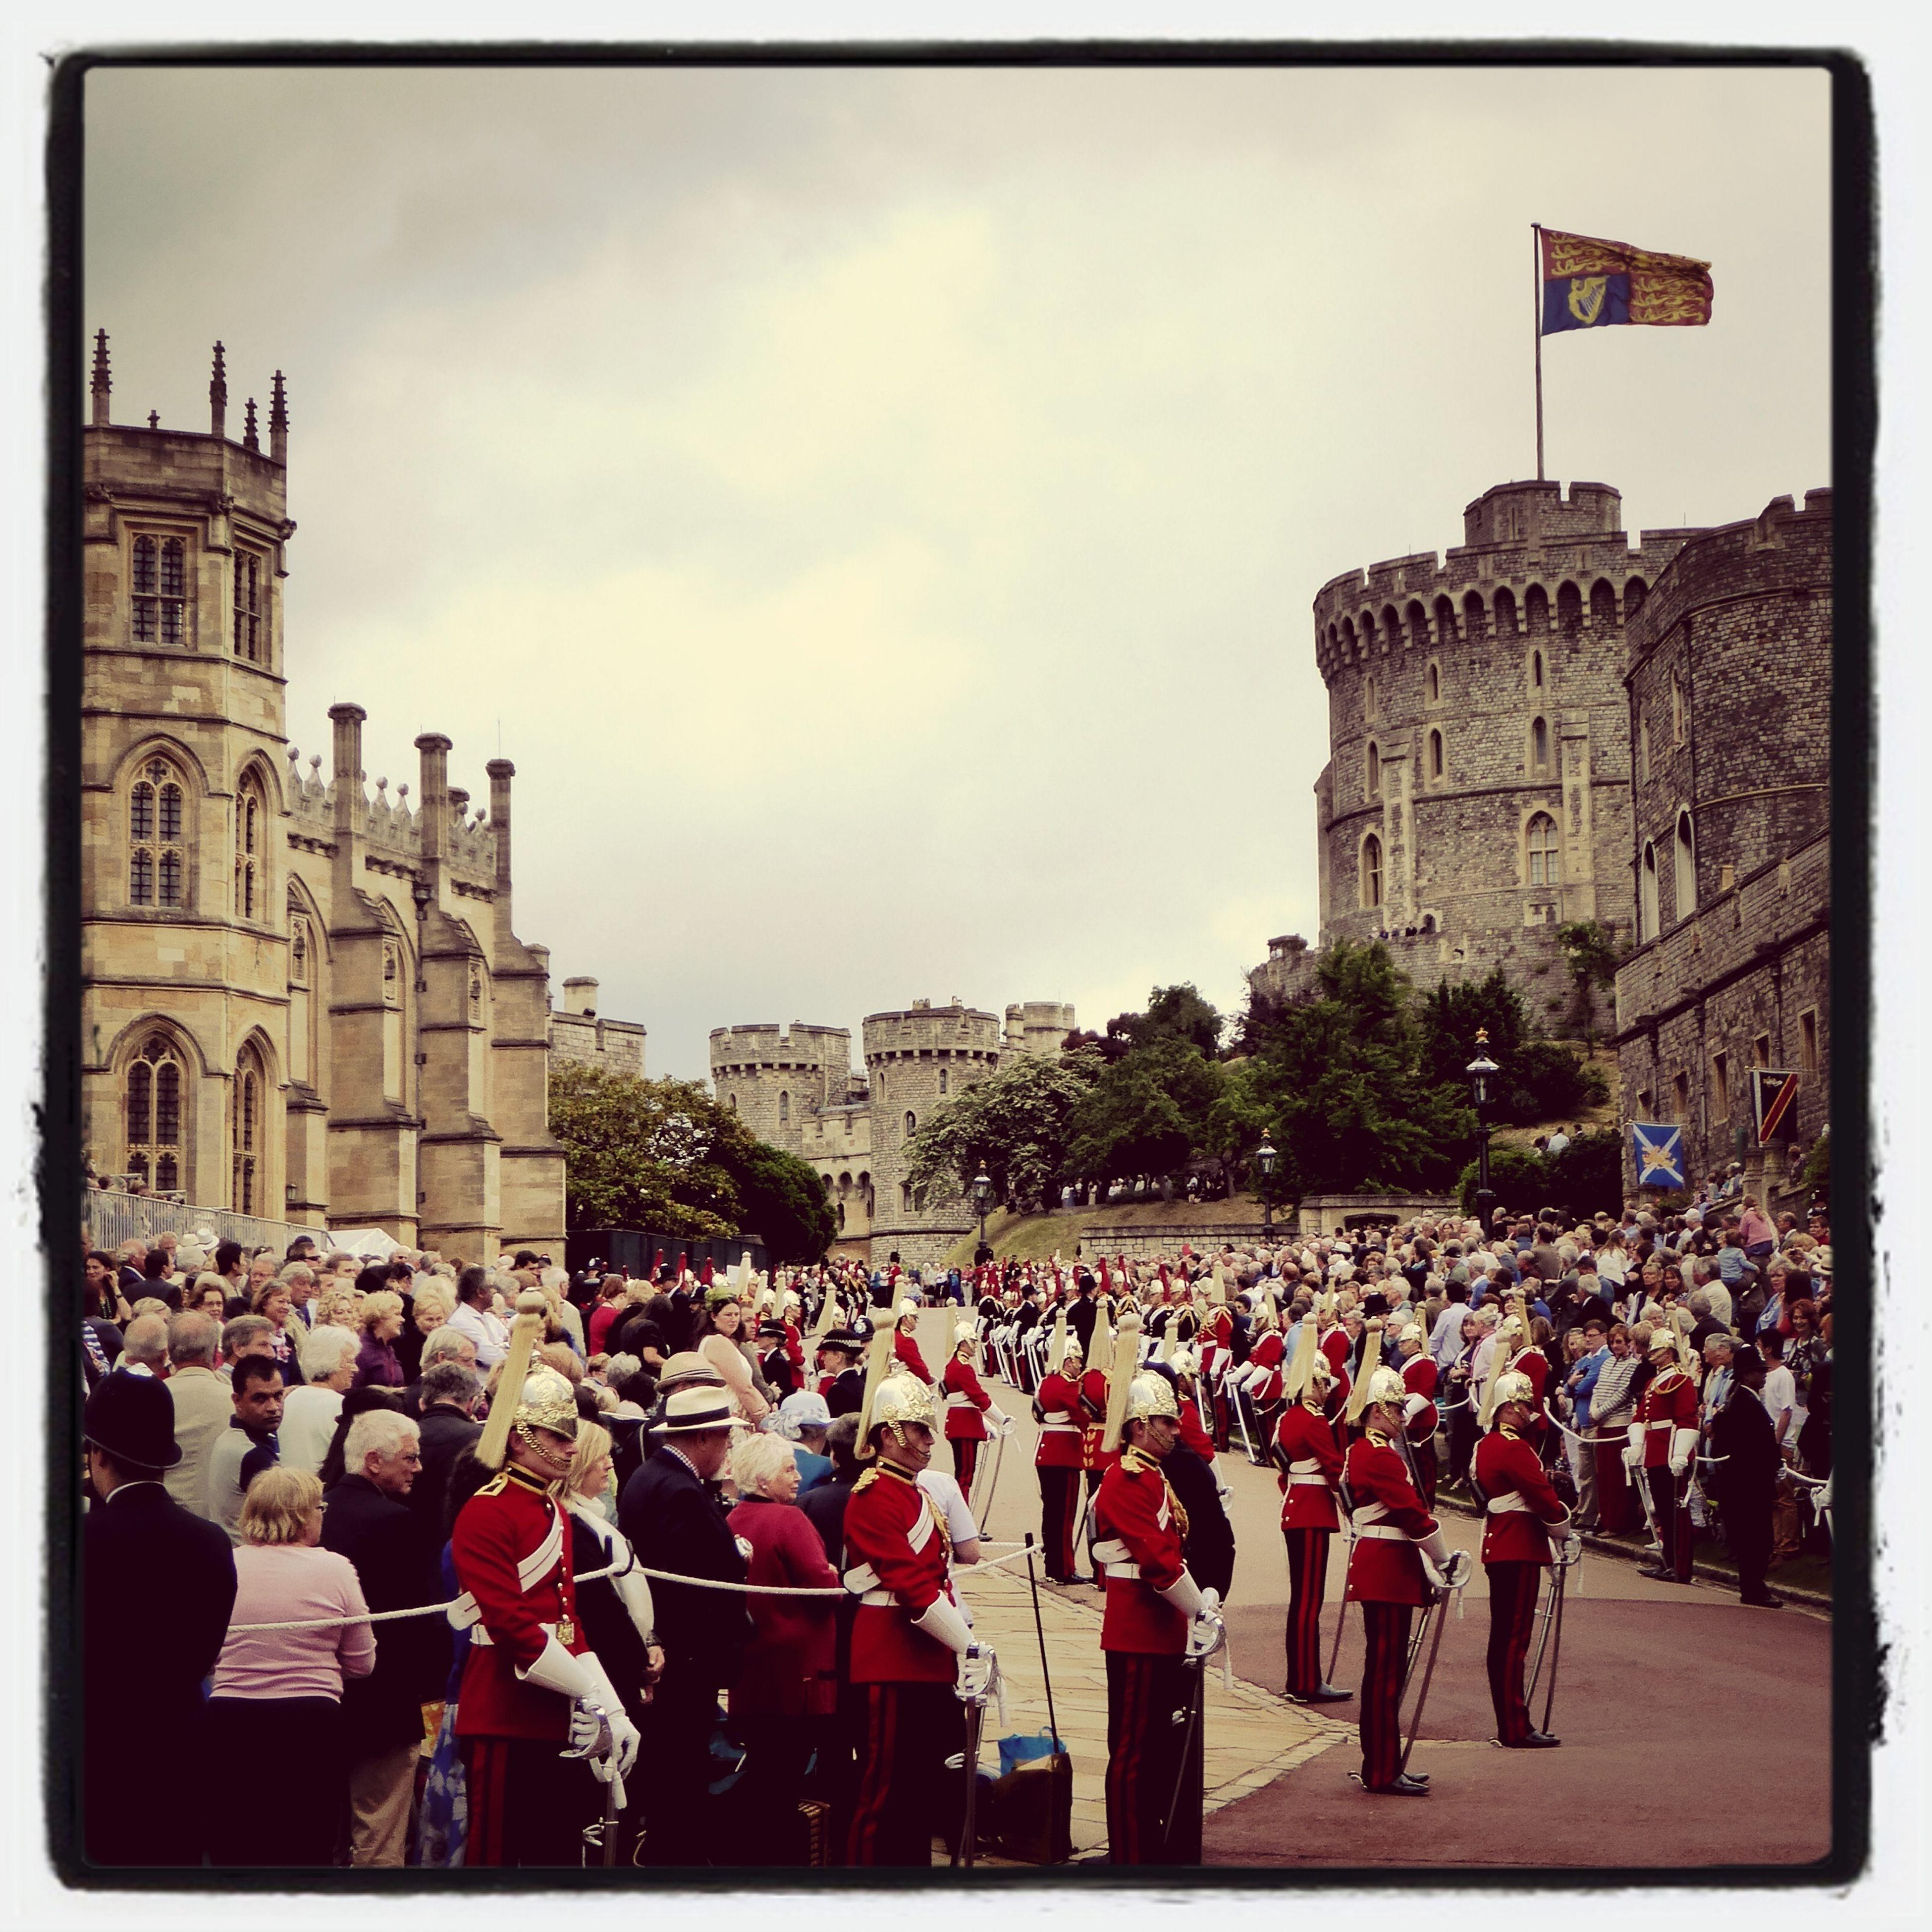 Windsor Castle St George's Chapel Order Of The Garter ceremony, June 2014